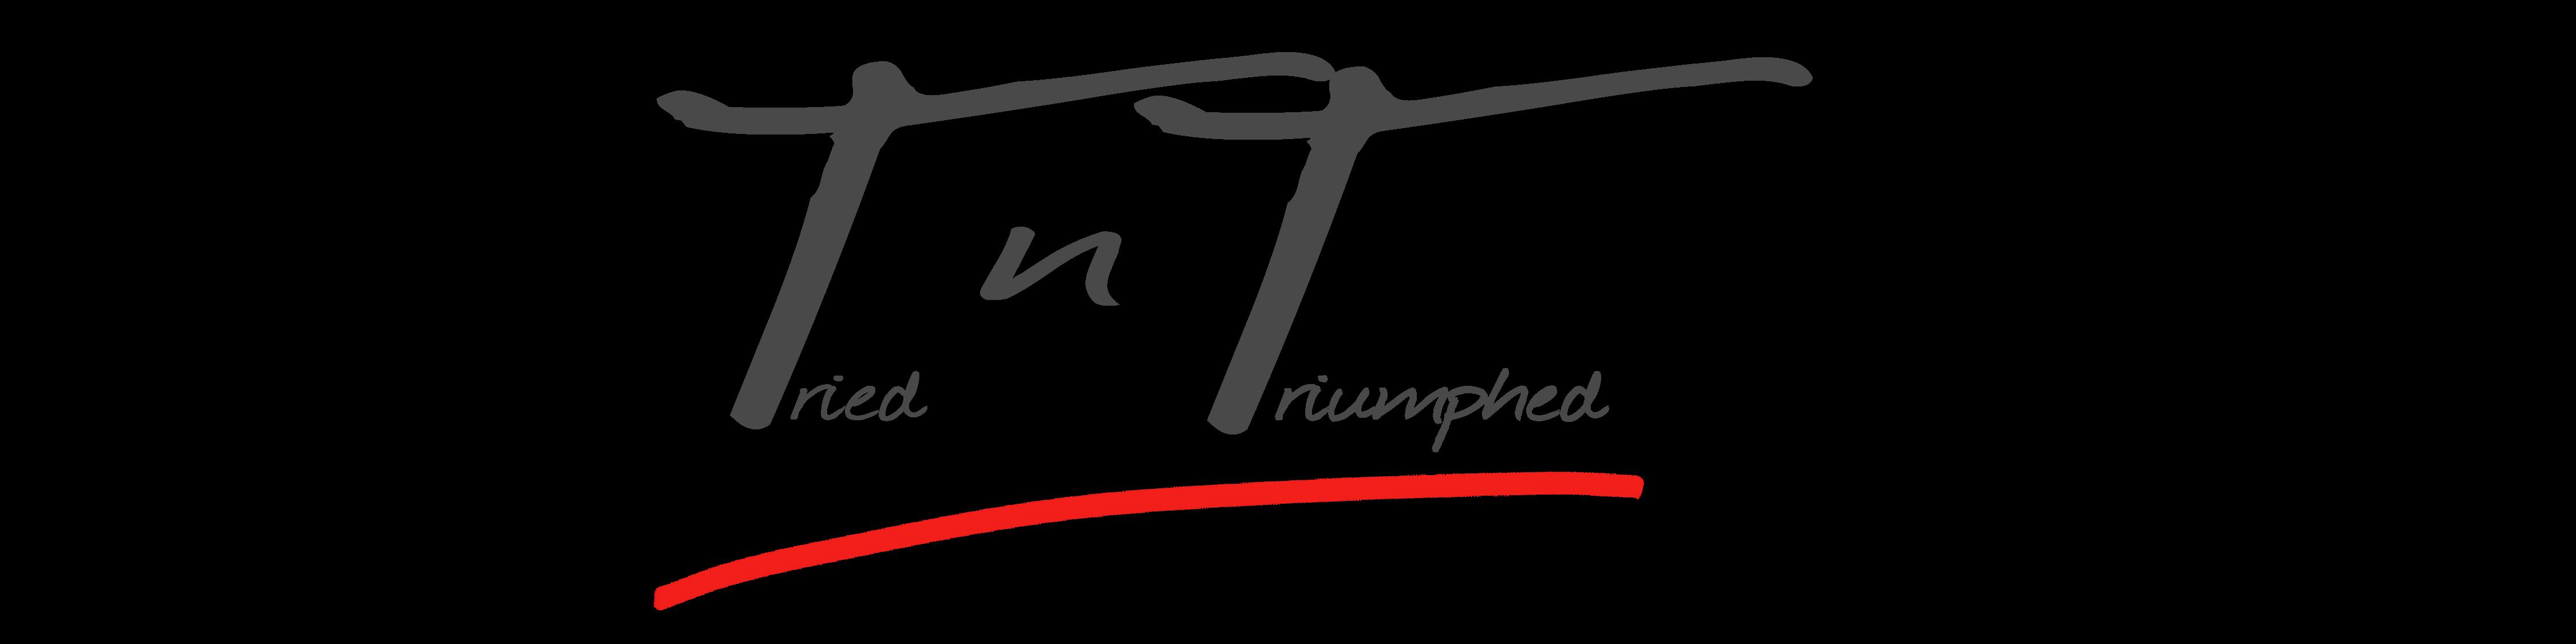 Tried 'n' Triumphed